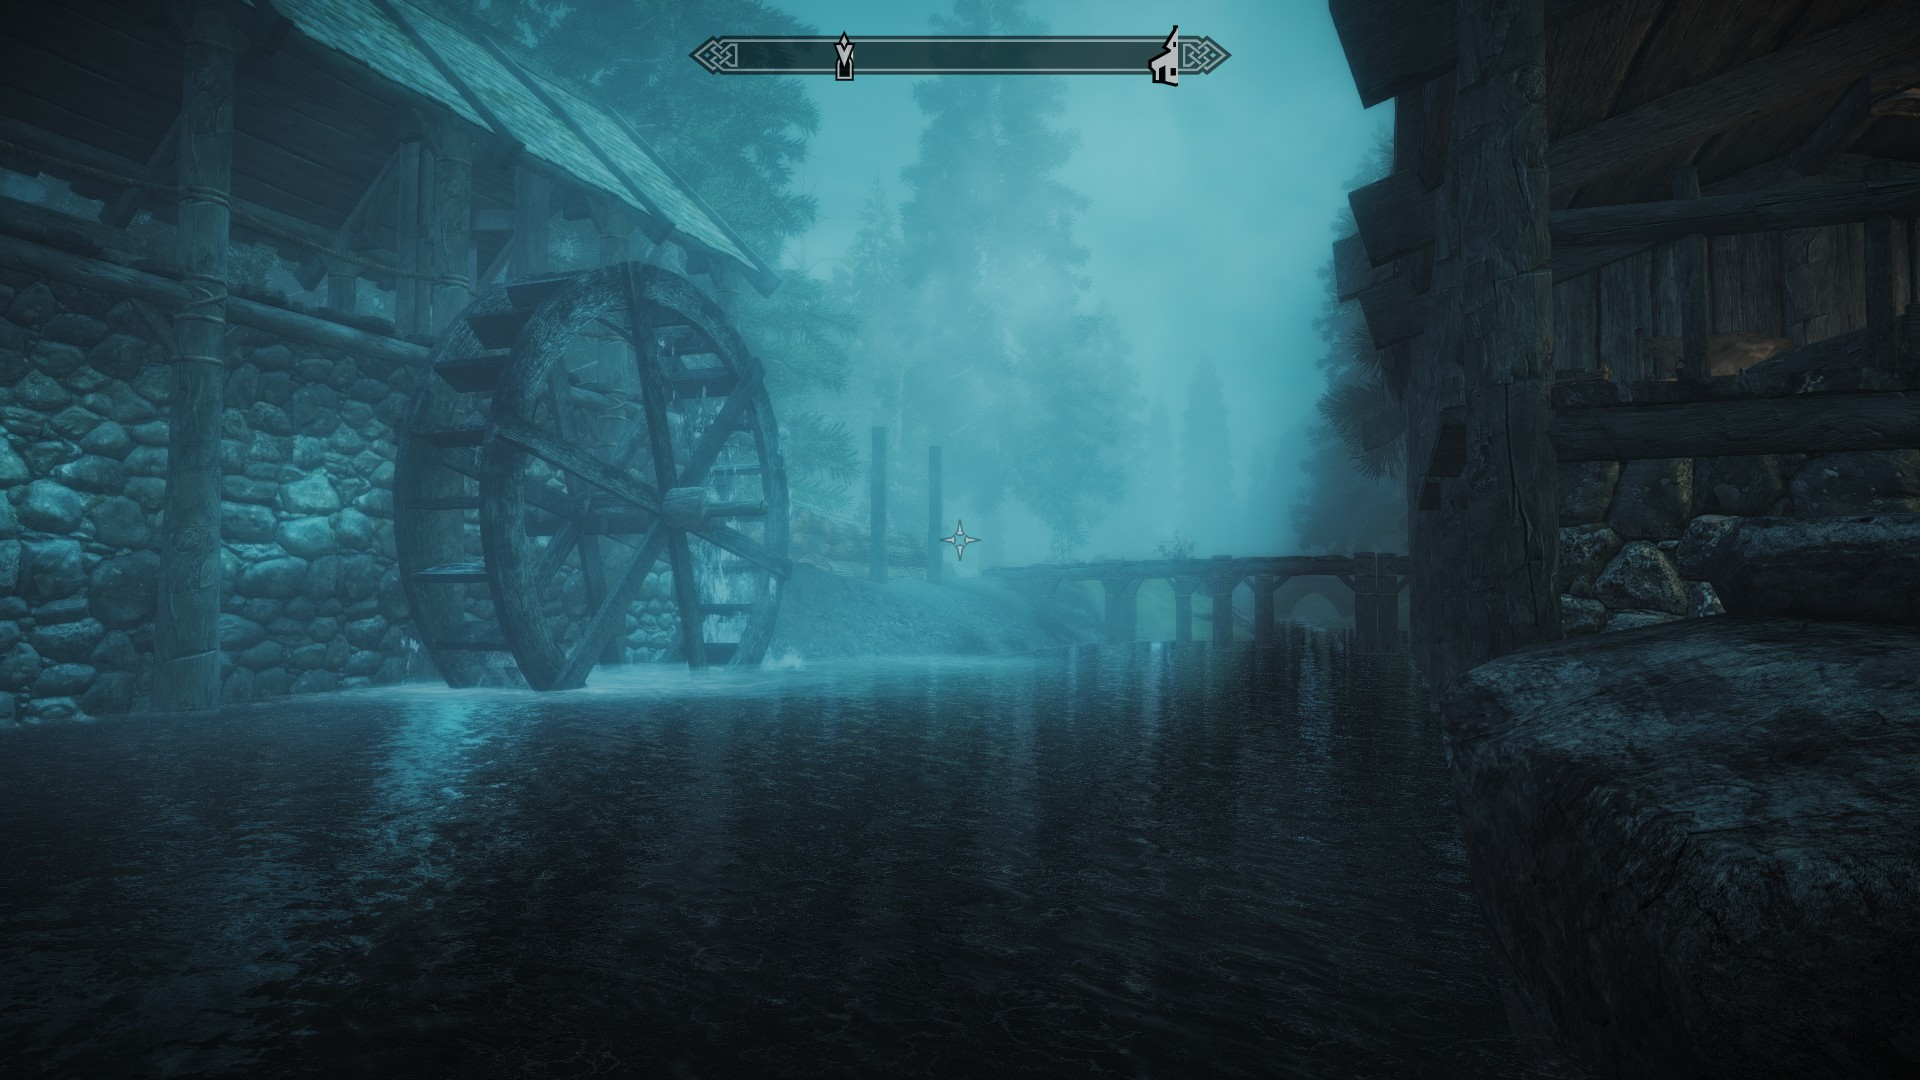 20180210143644_1.jpg - Elder Scrolls 5: Skyrim, the